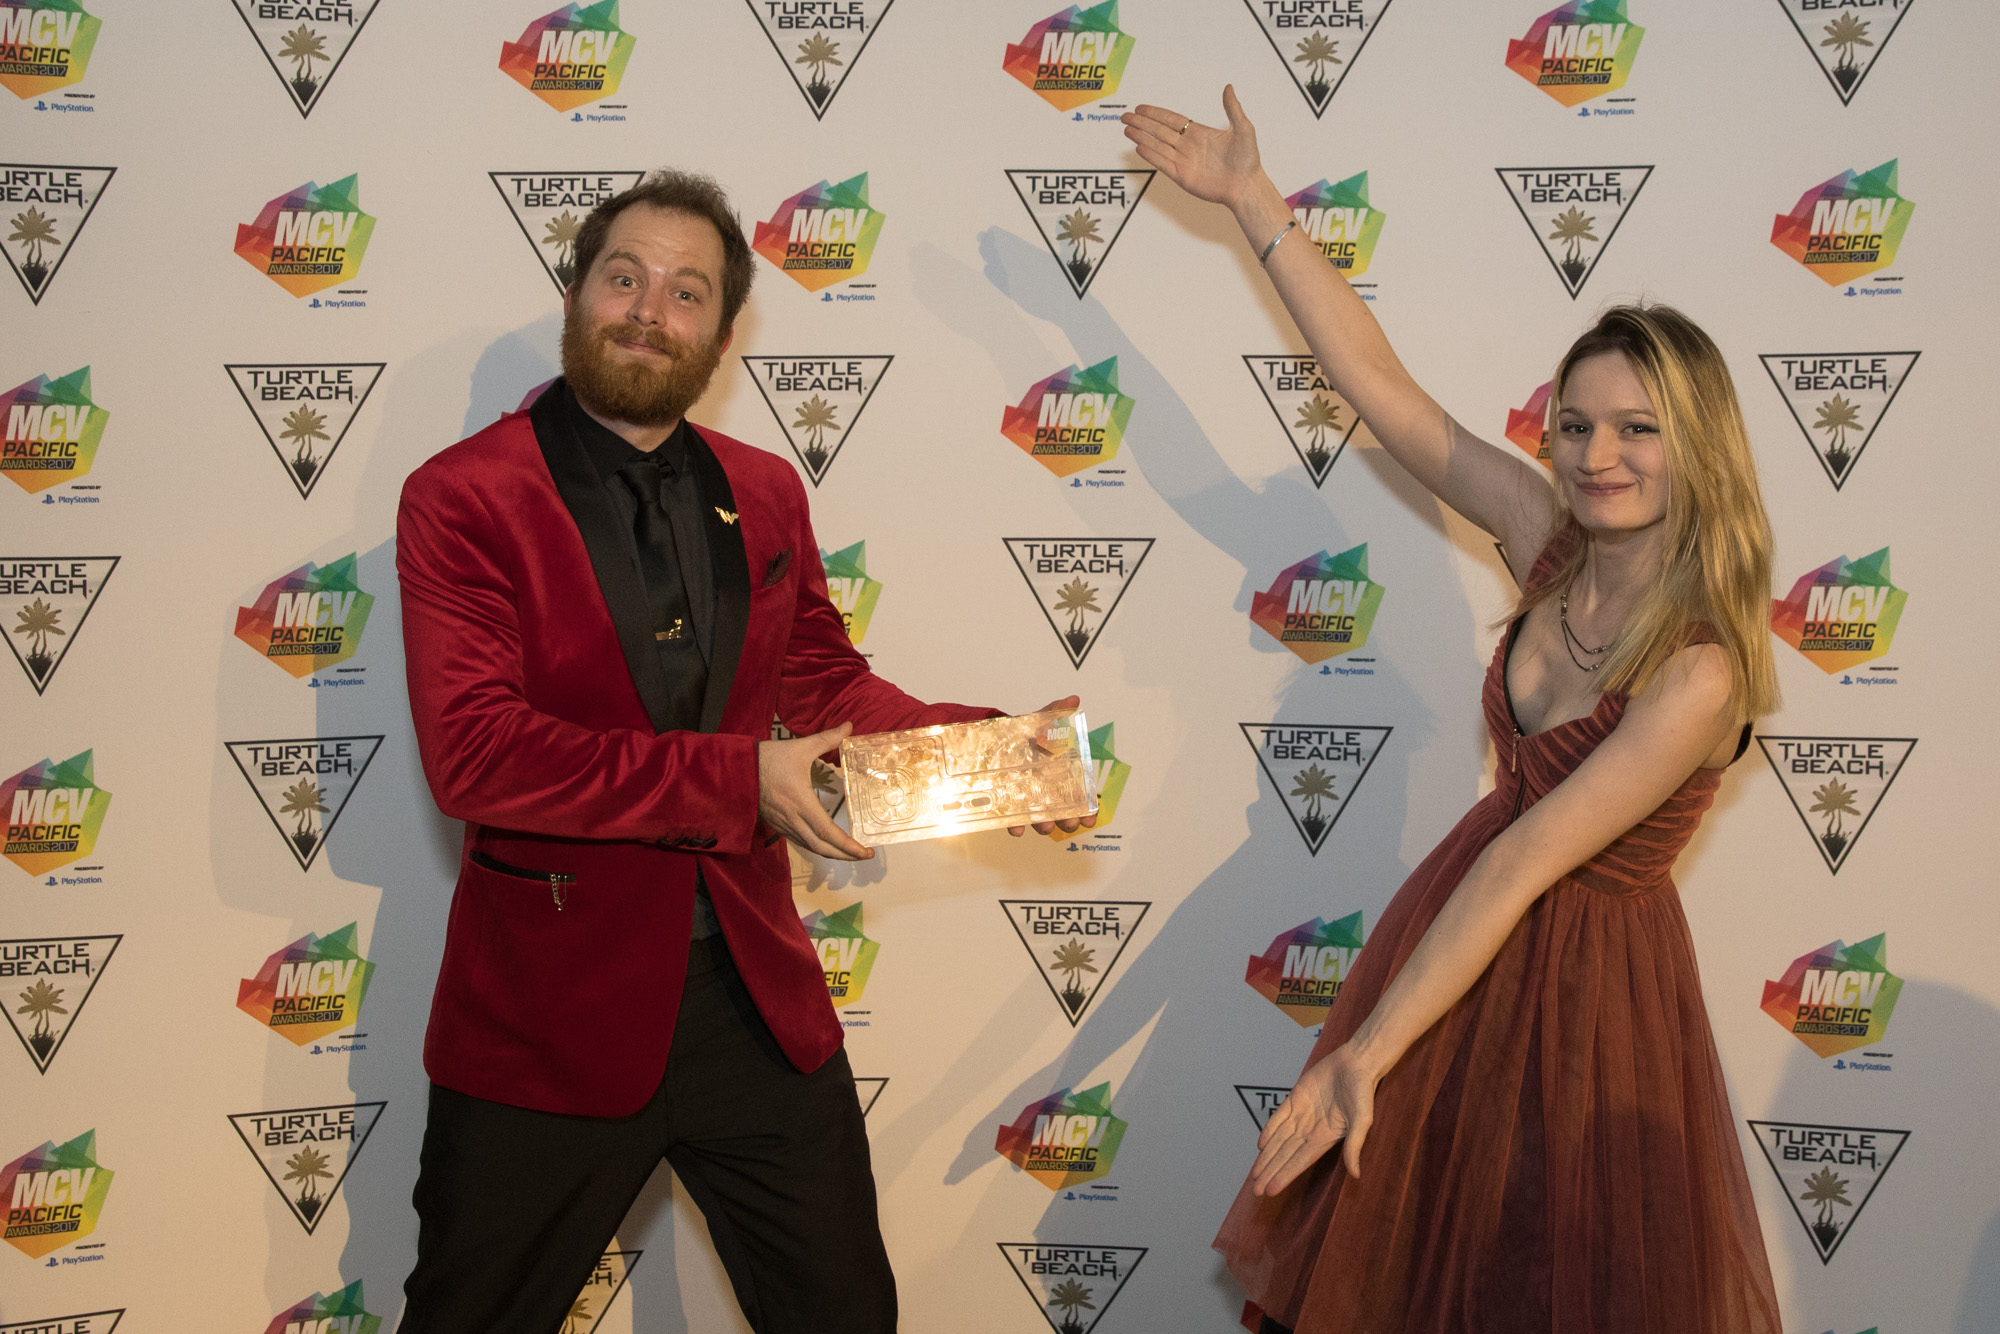 MCV_Pacific_Awards_1_June_17_PS_142.jpg